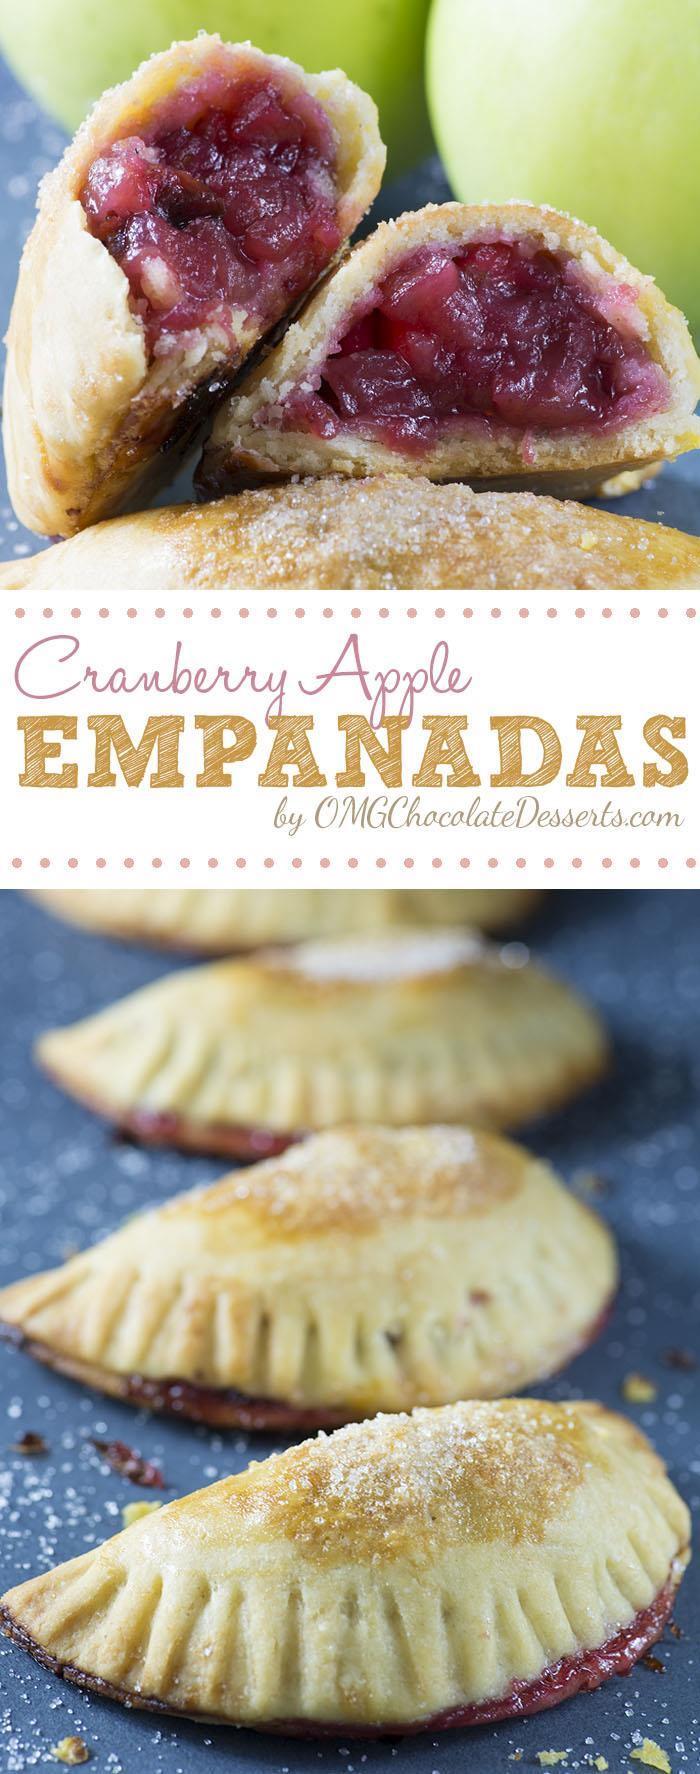 Cranberry Apple Empanadas